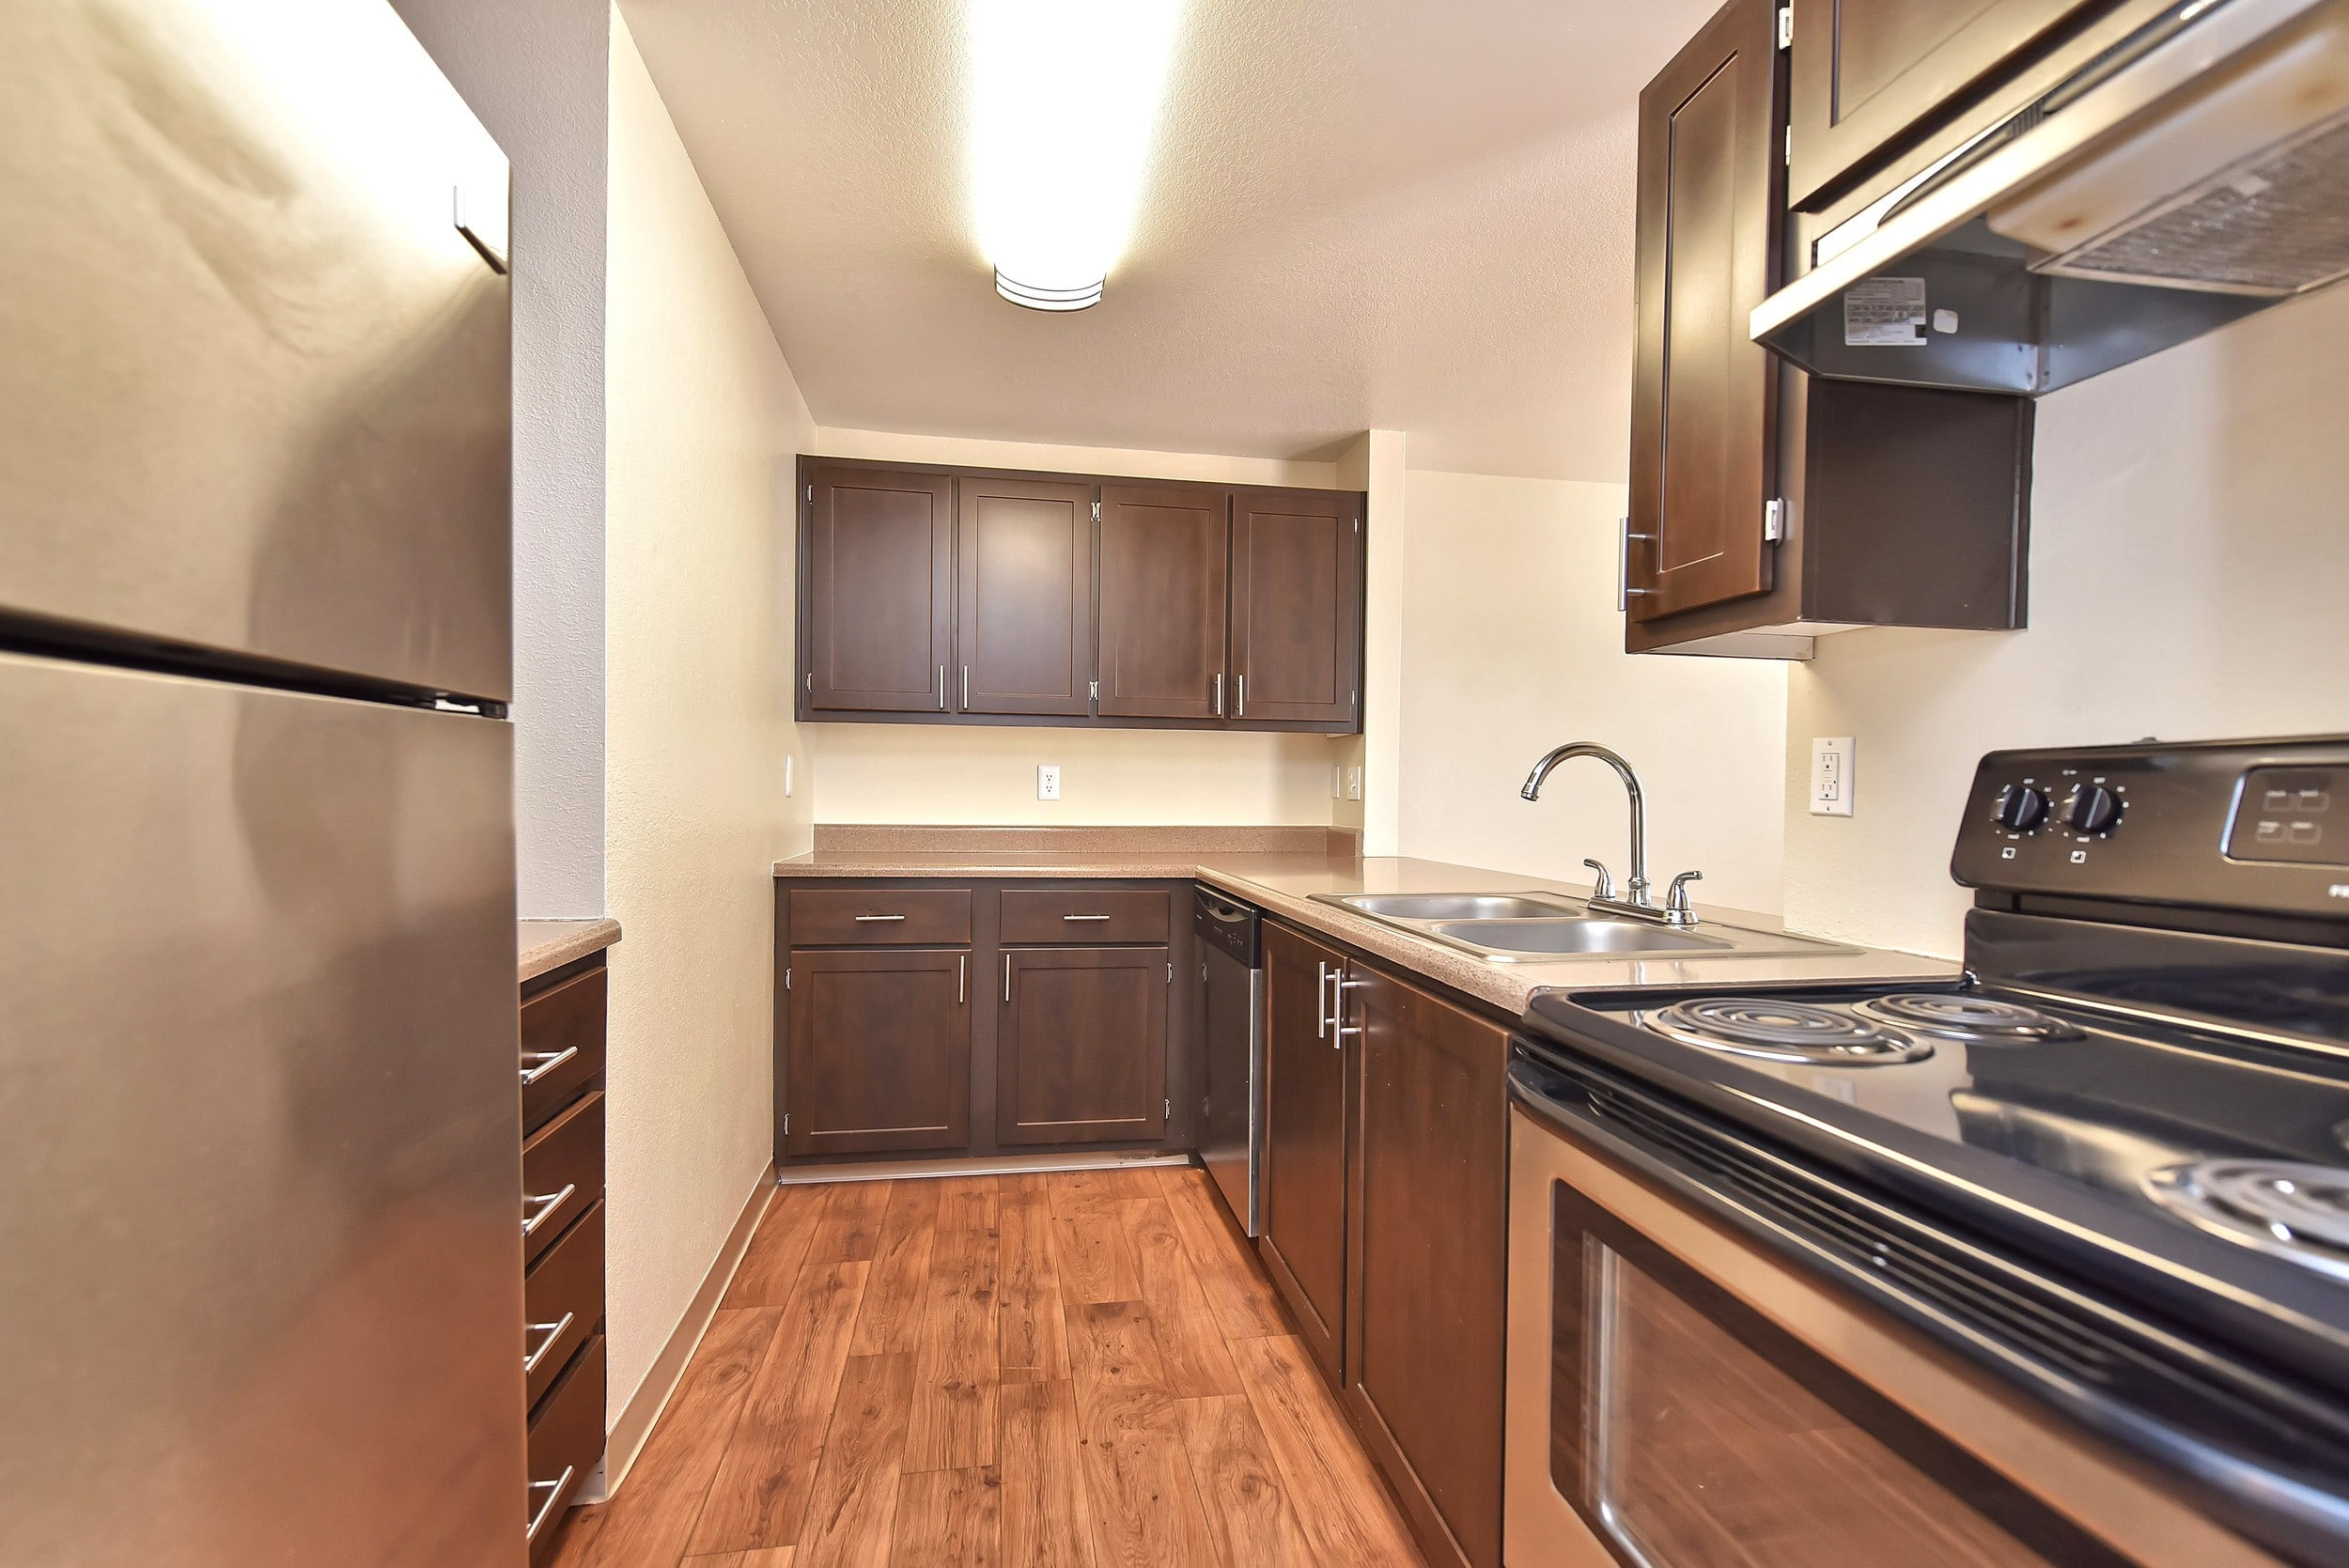 Kitchen at Preserve at Sunnyside Apartments in Clackamas, Oregon